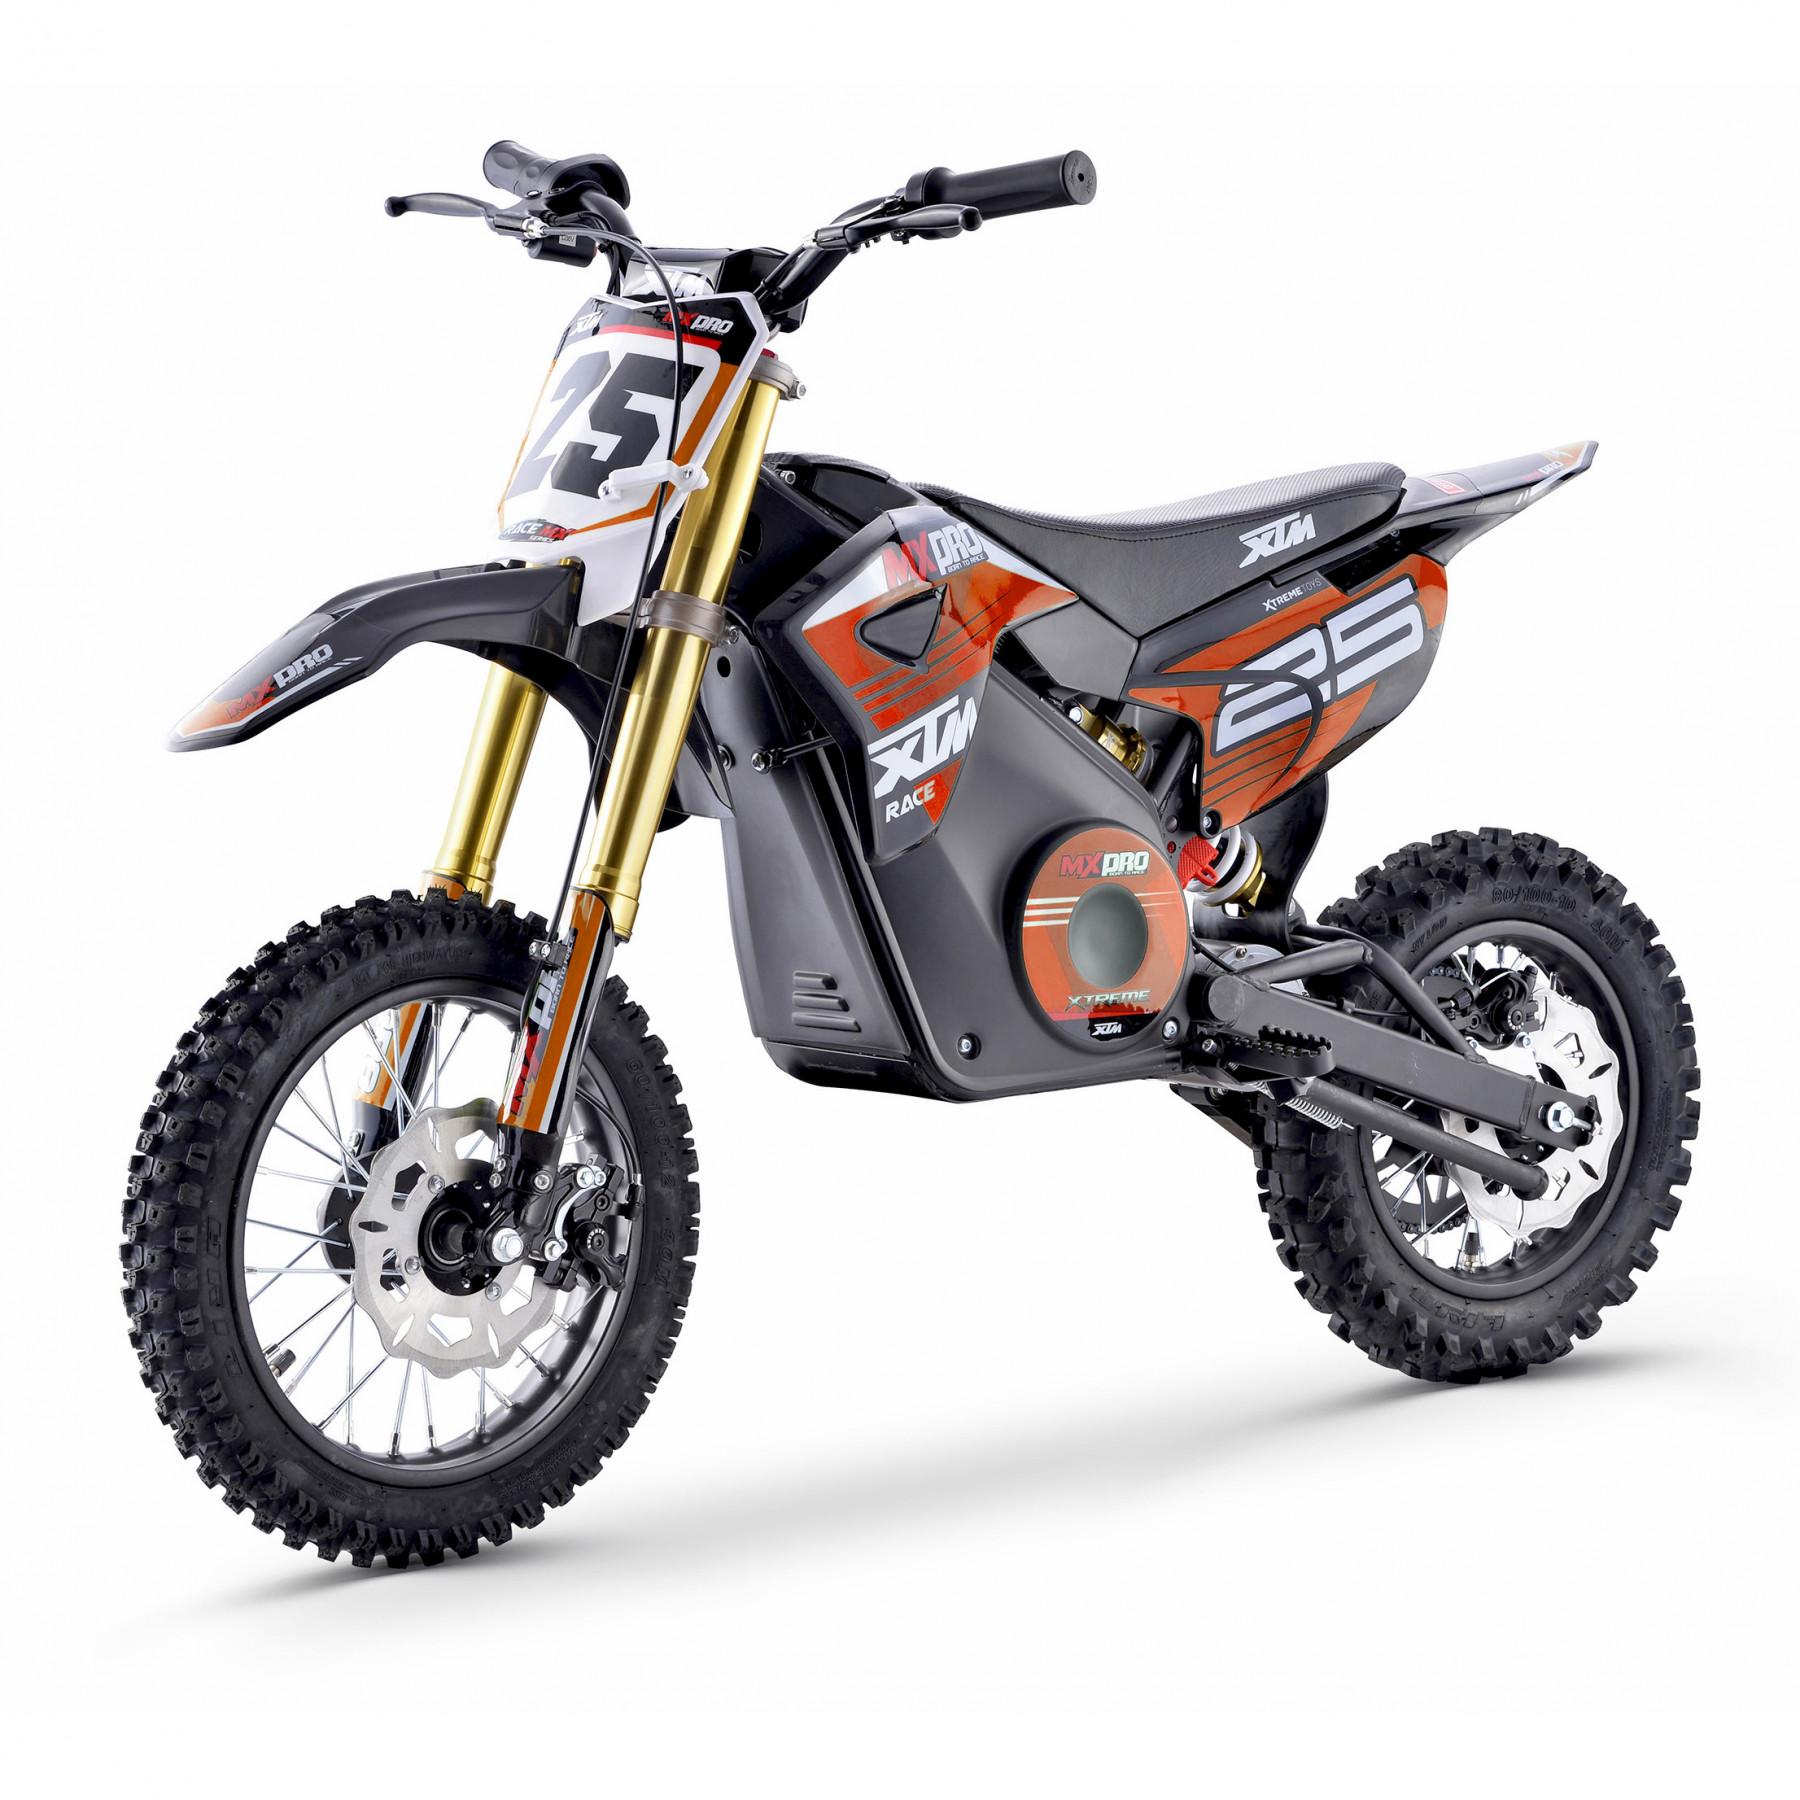 XTM MX-PRO 36V 1000W DIRT BIKE ORANGE